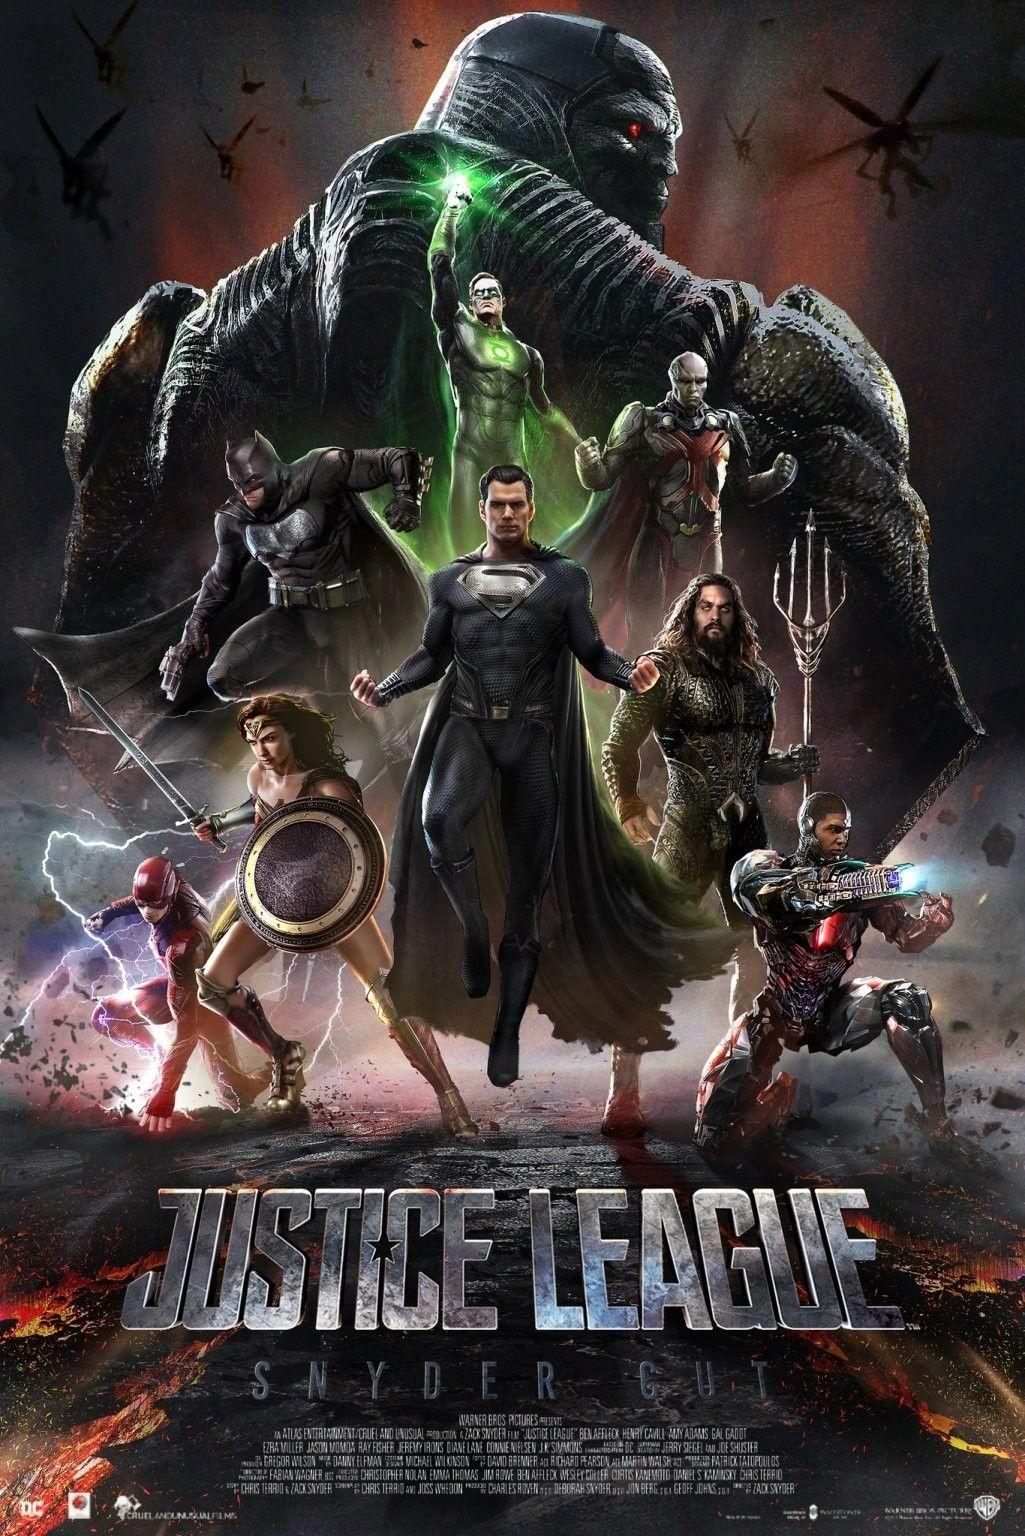 Bosslogic On Twitter In 2020 Justice League Comics Dc Comics Wallpaper Justice League Art